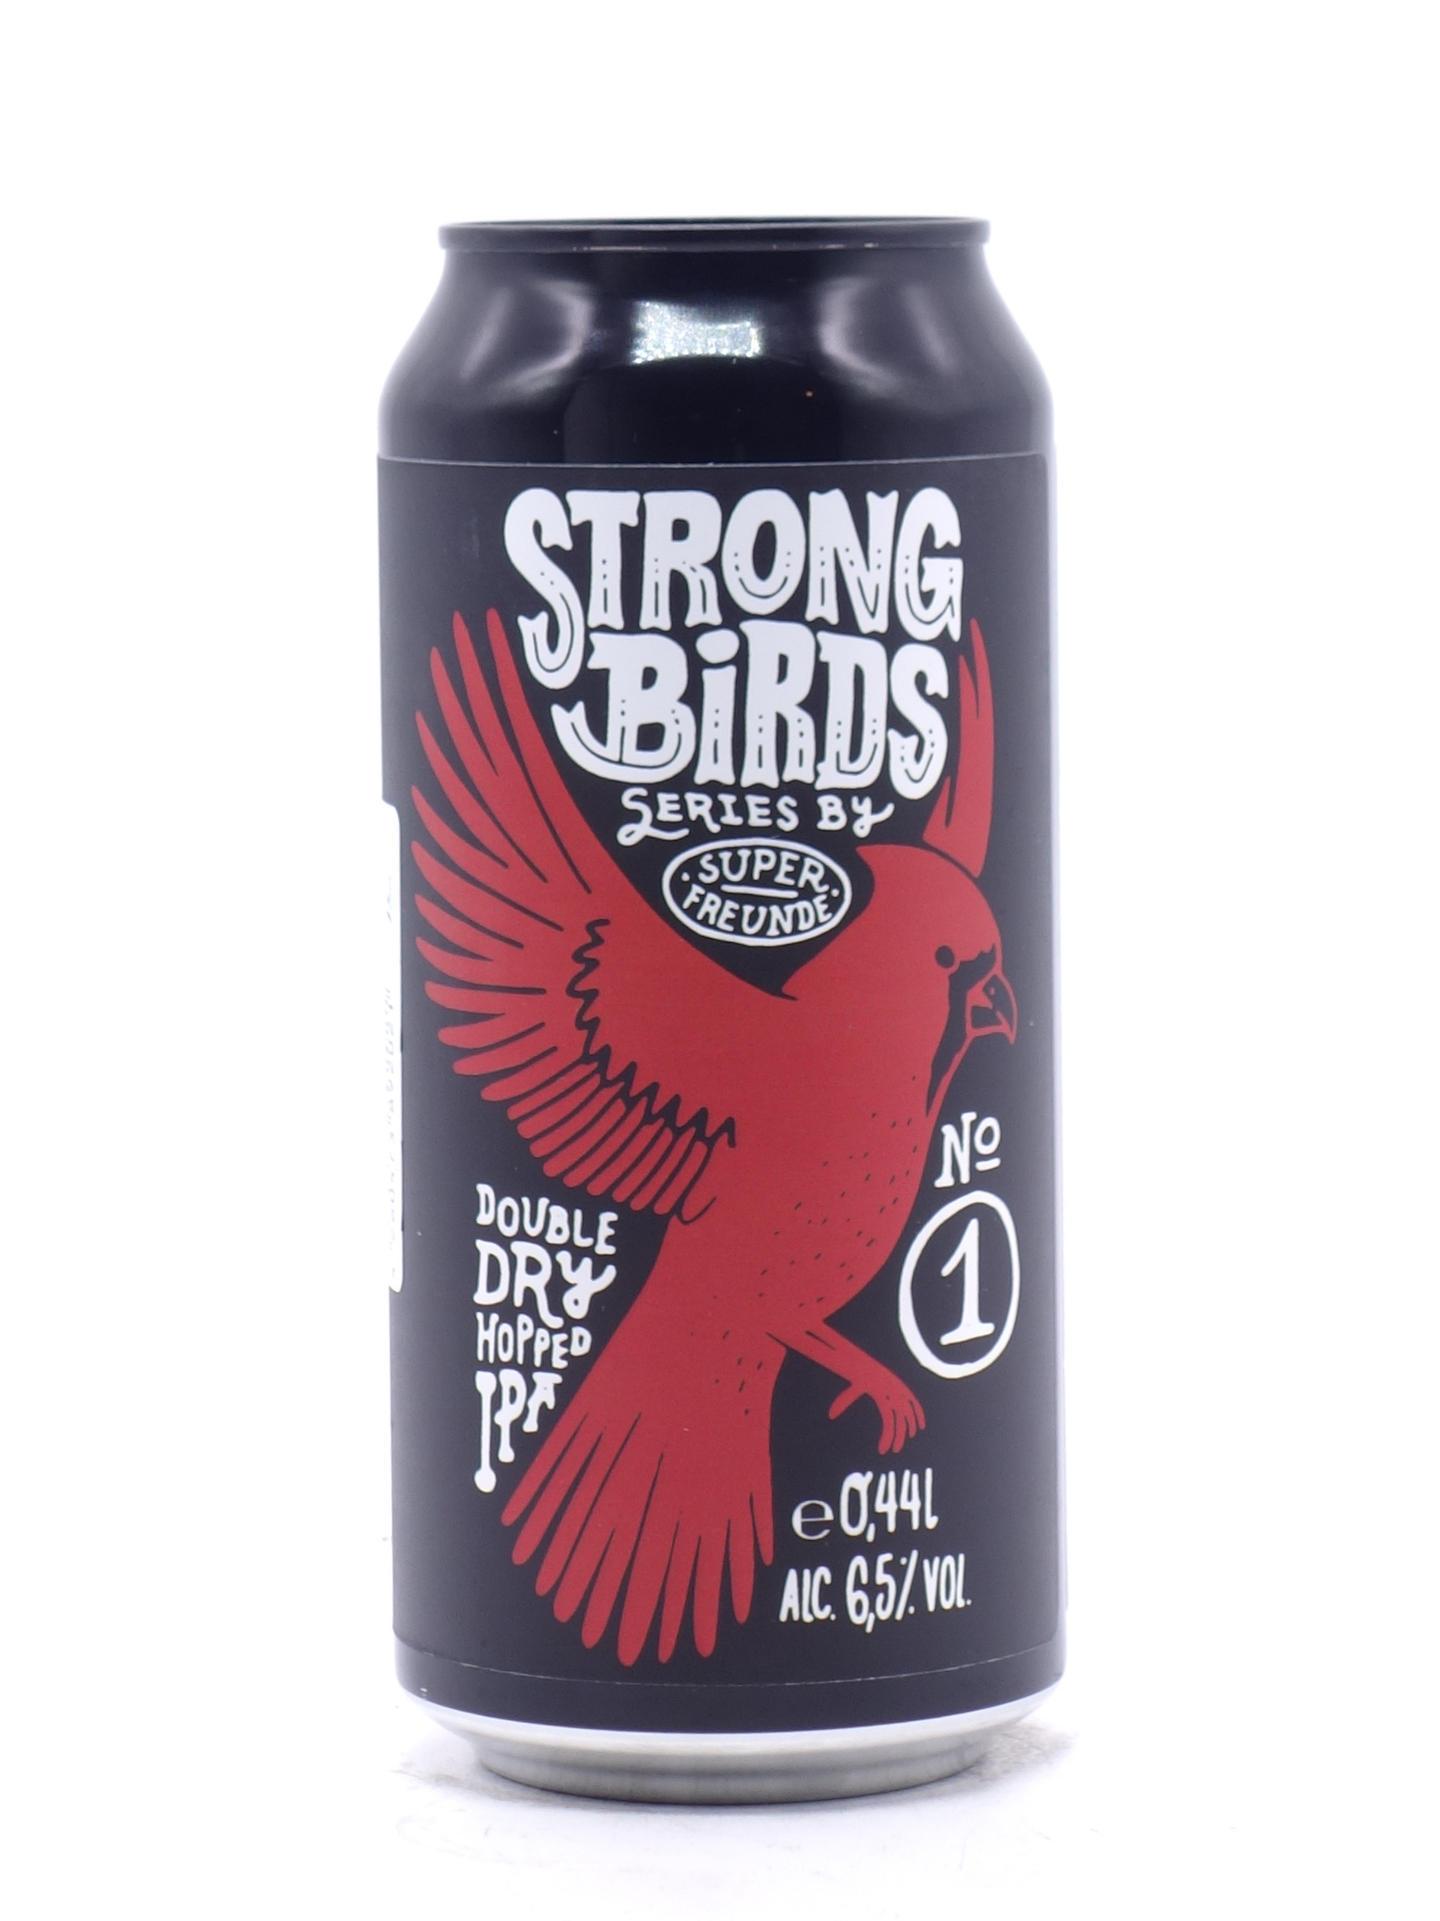 Superfreunde Strong Birds No. 21   DDH IPA kaufen